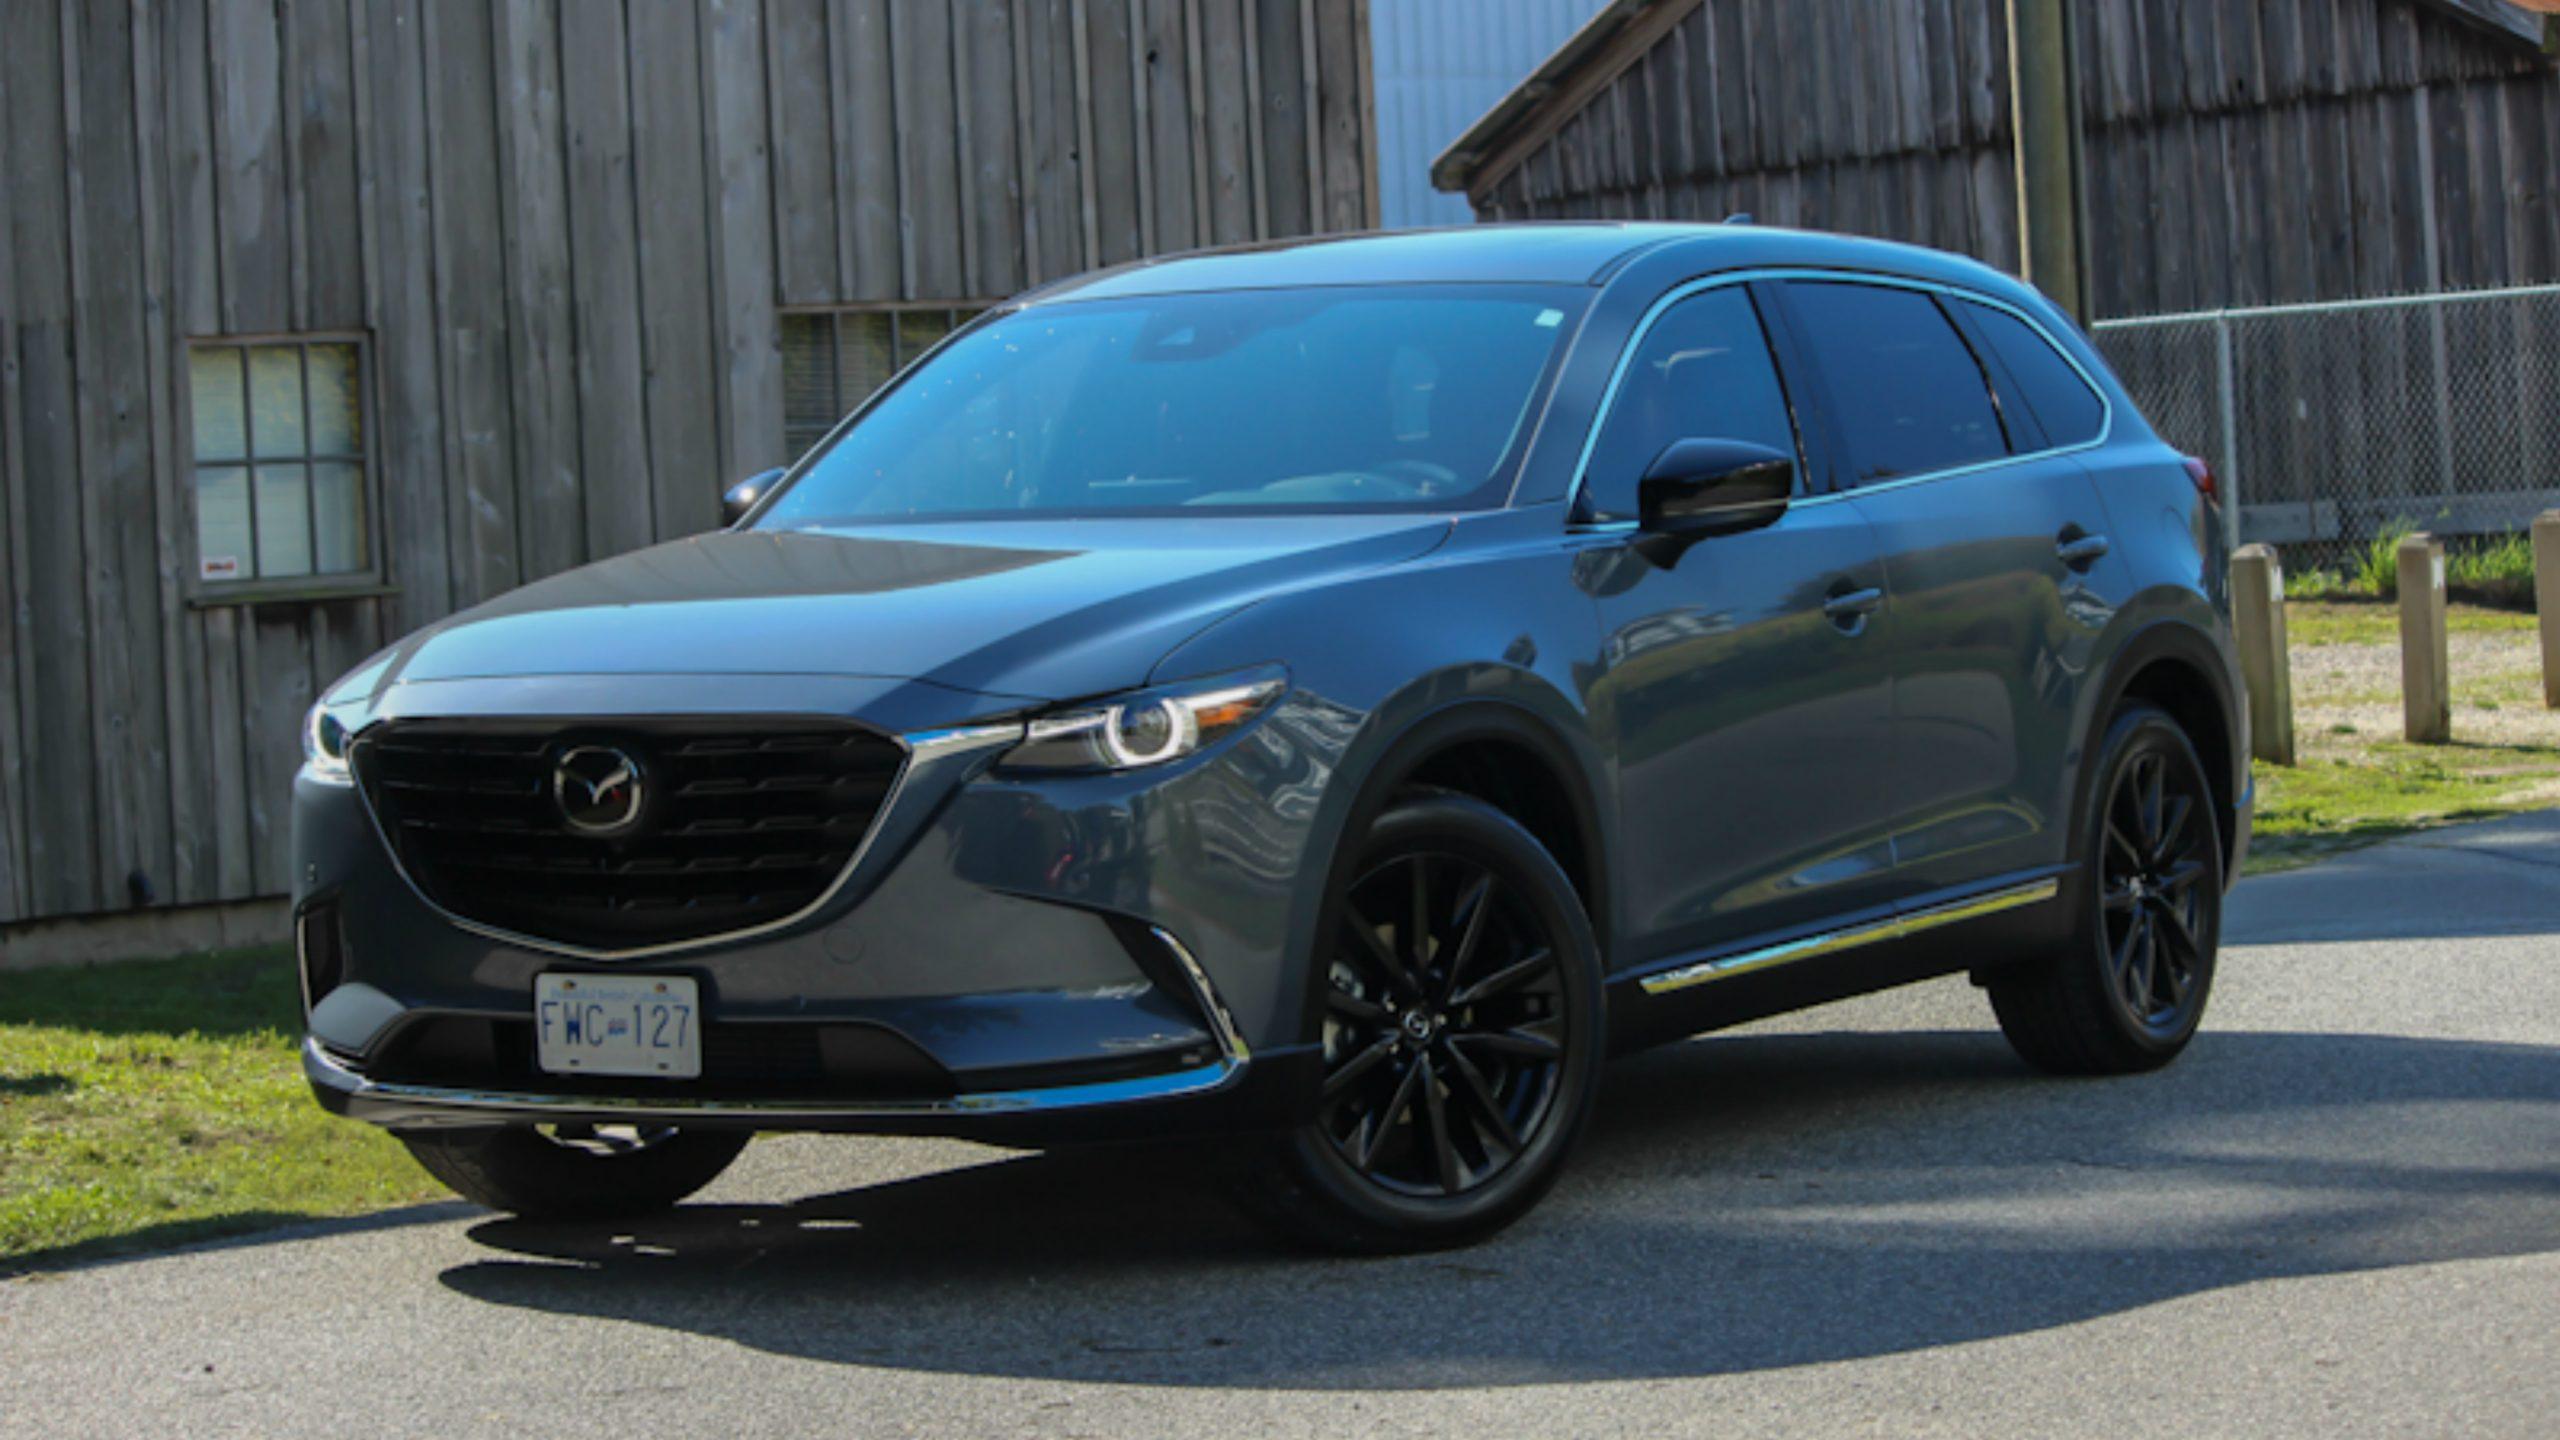 Review 2021 Mazda CX-9 Kuro